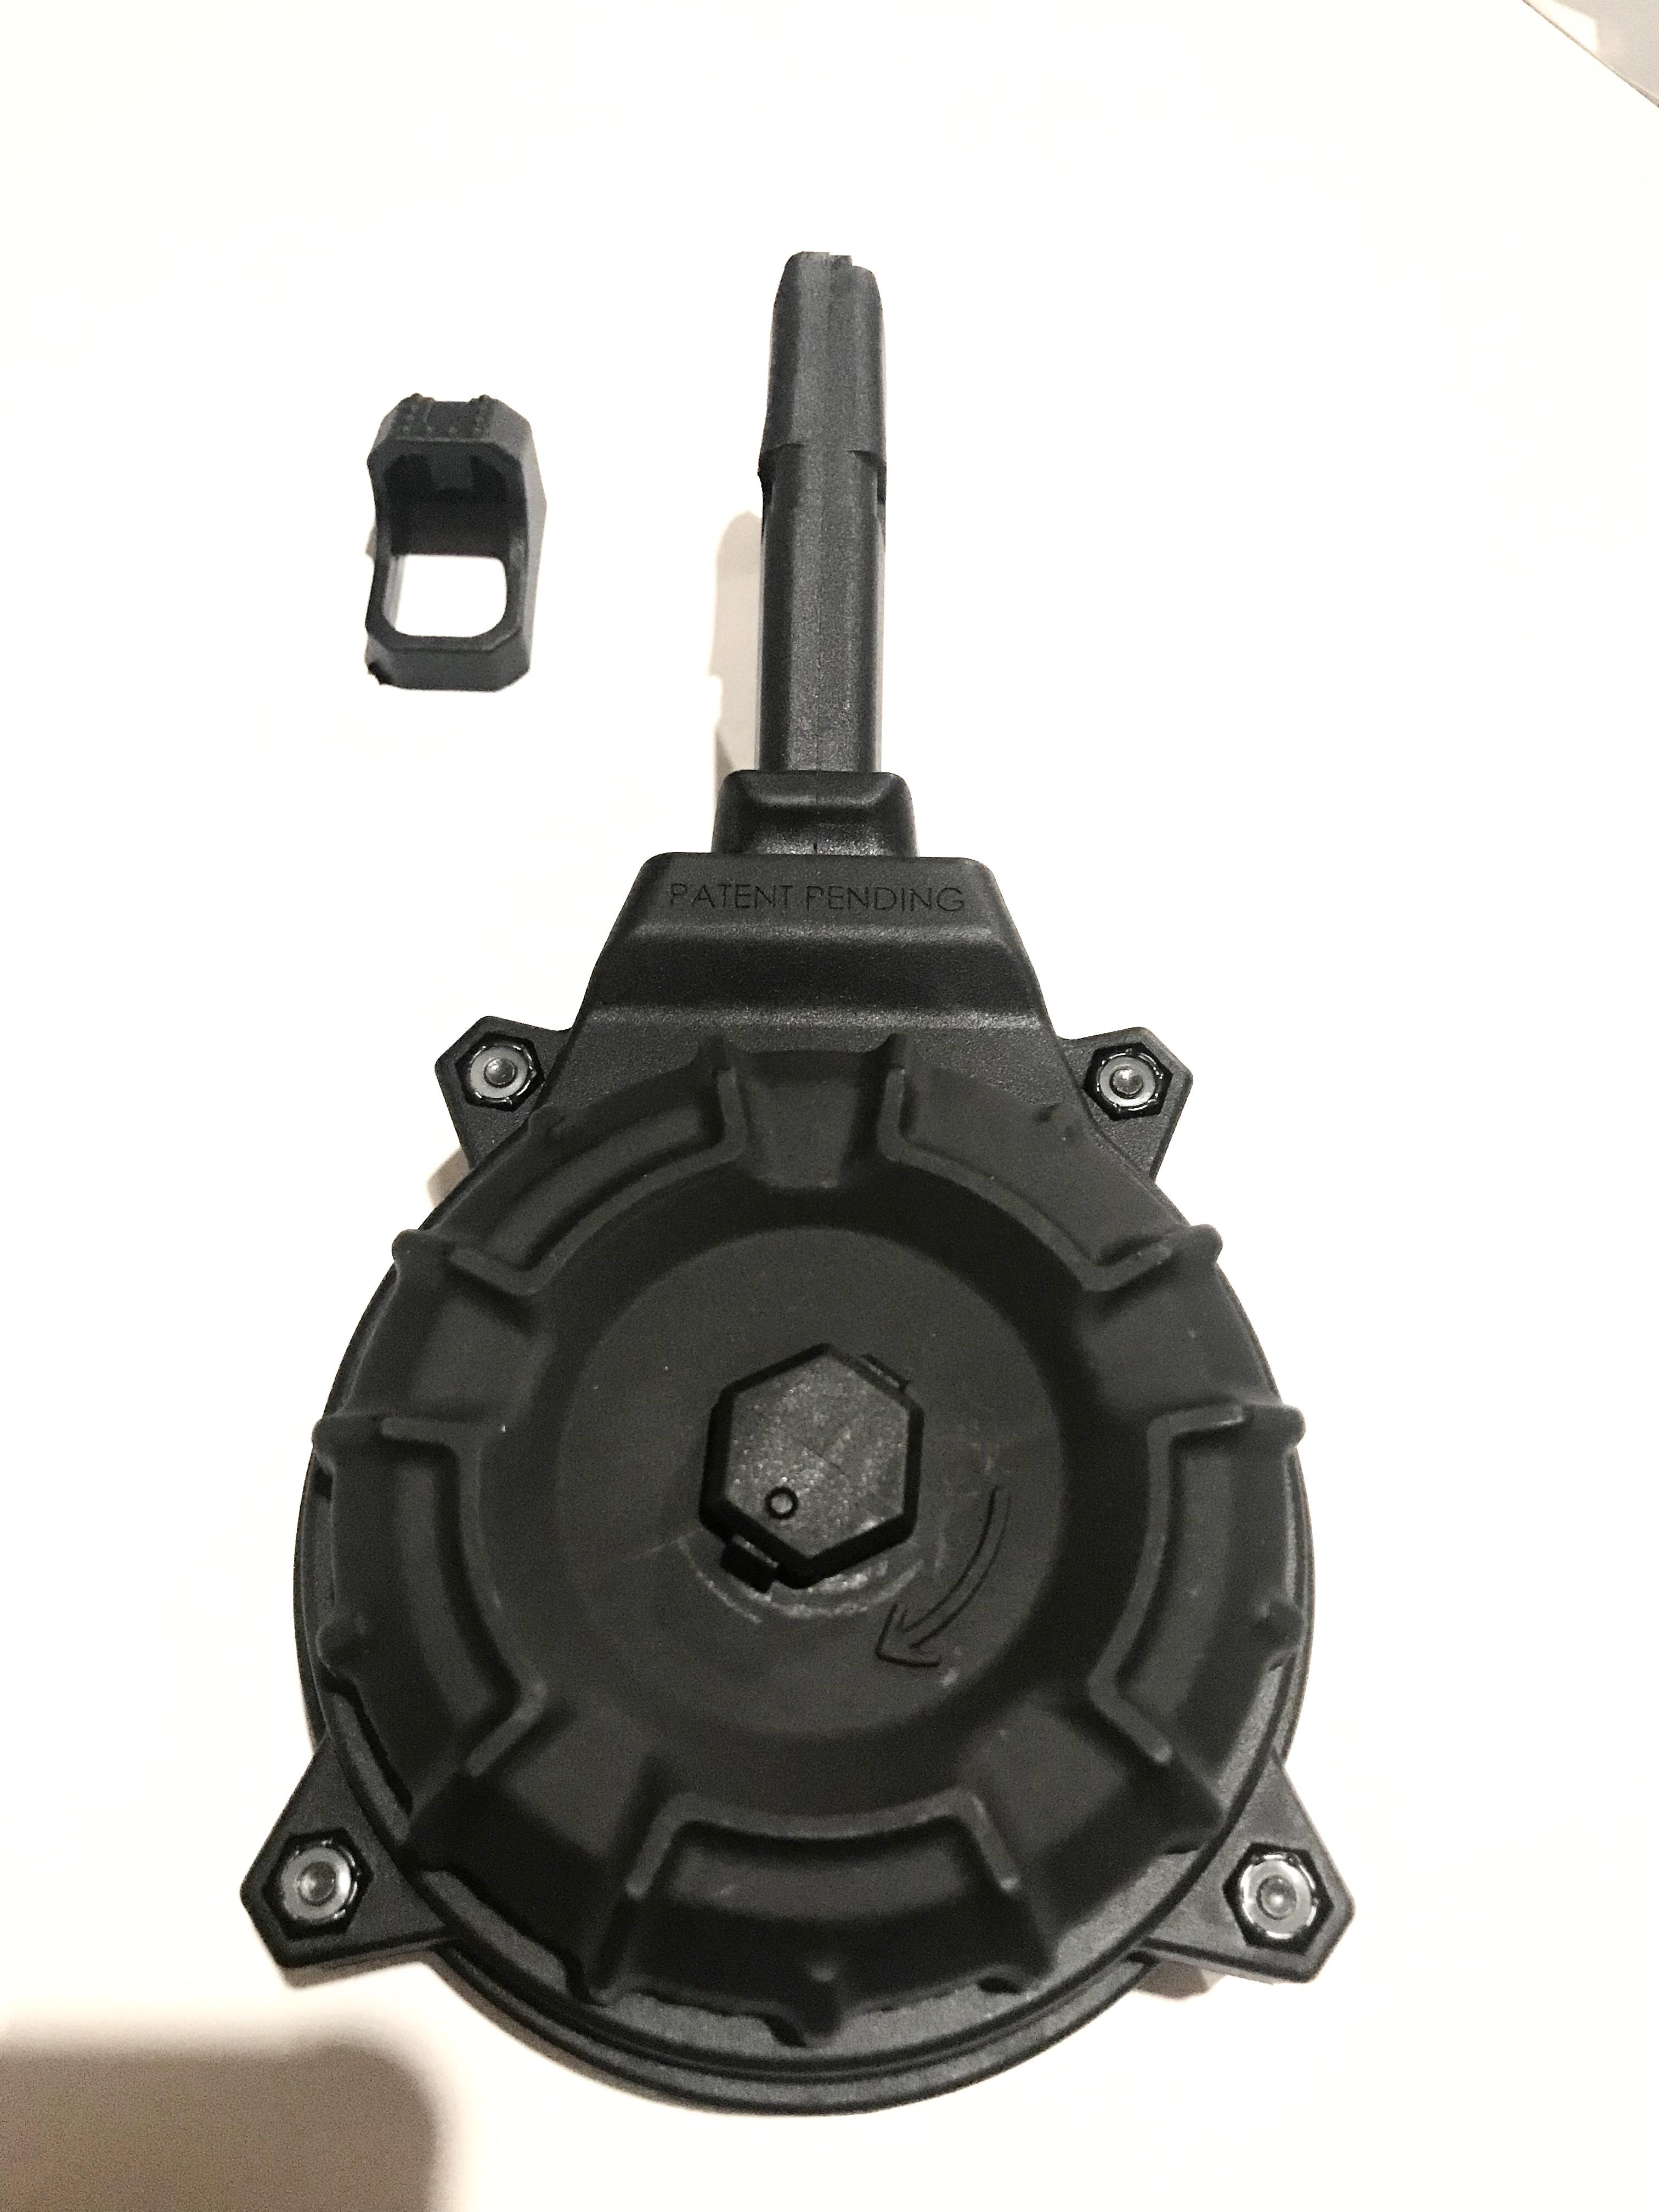 Glock 43 9mm 50 round magazine DRM-A14